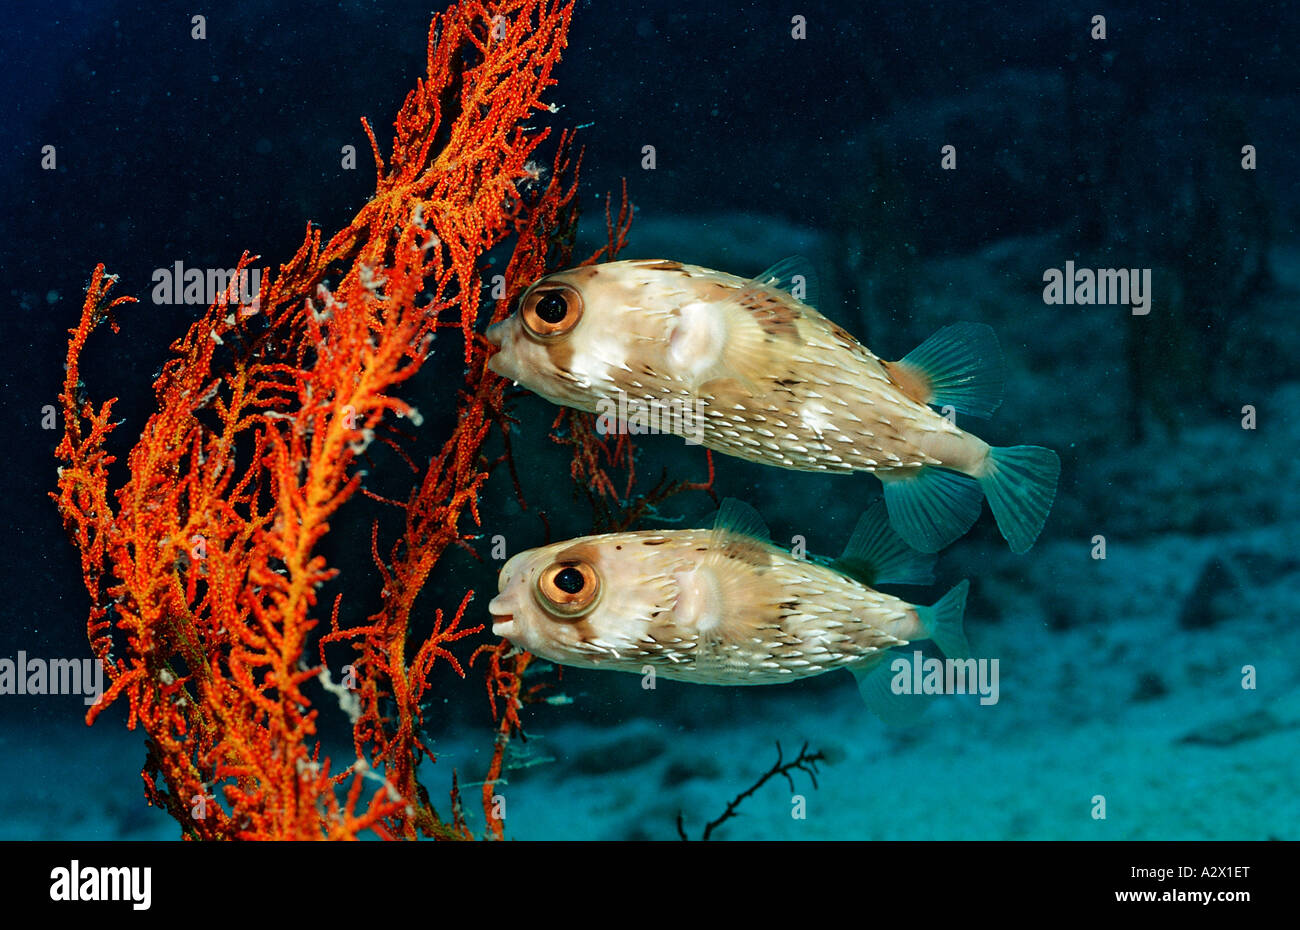 Two Balloonfishes Diodon holocanthus Mexico Sea of Cortez Baja California La Paz - Stock Image